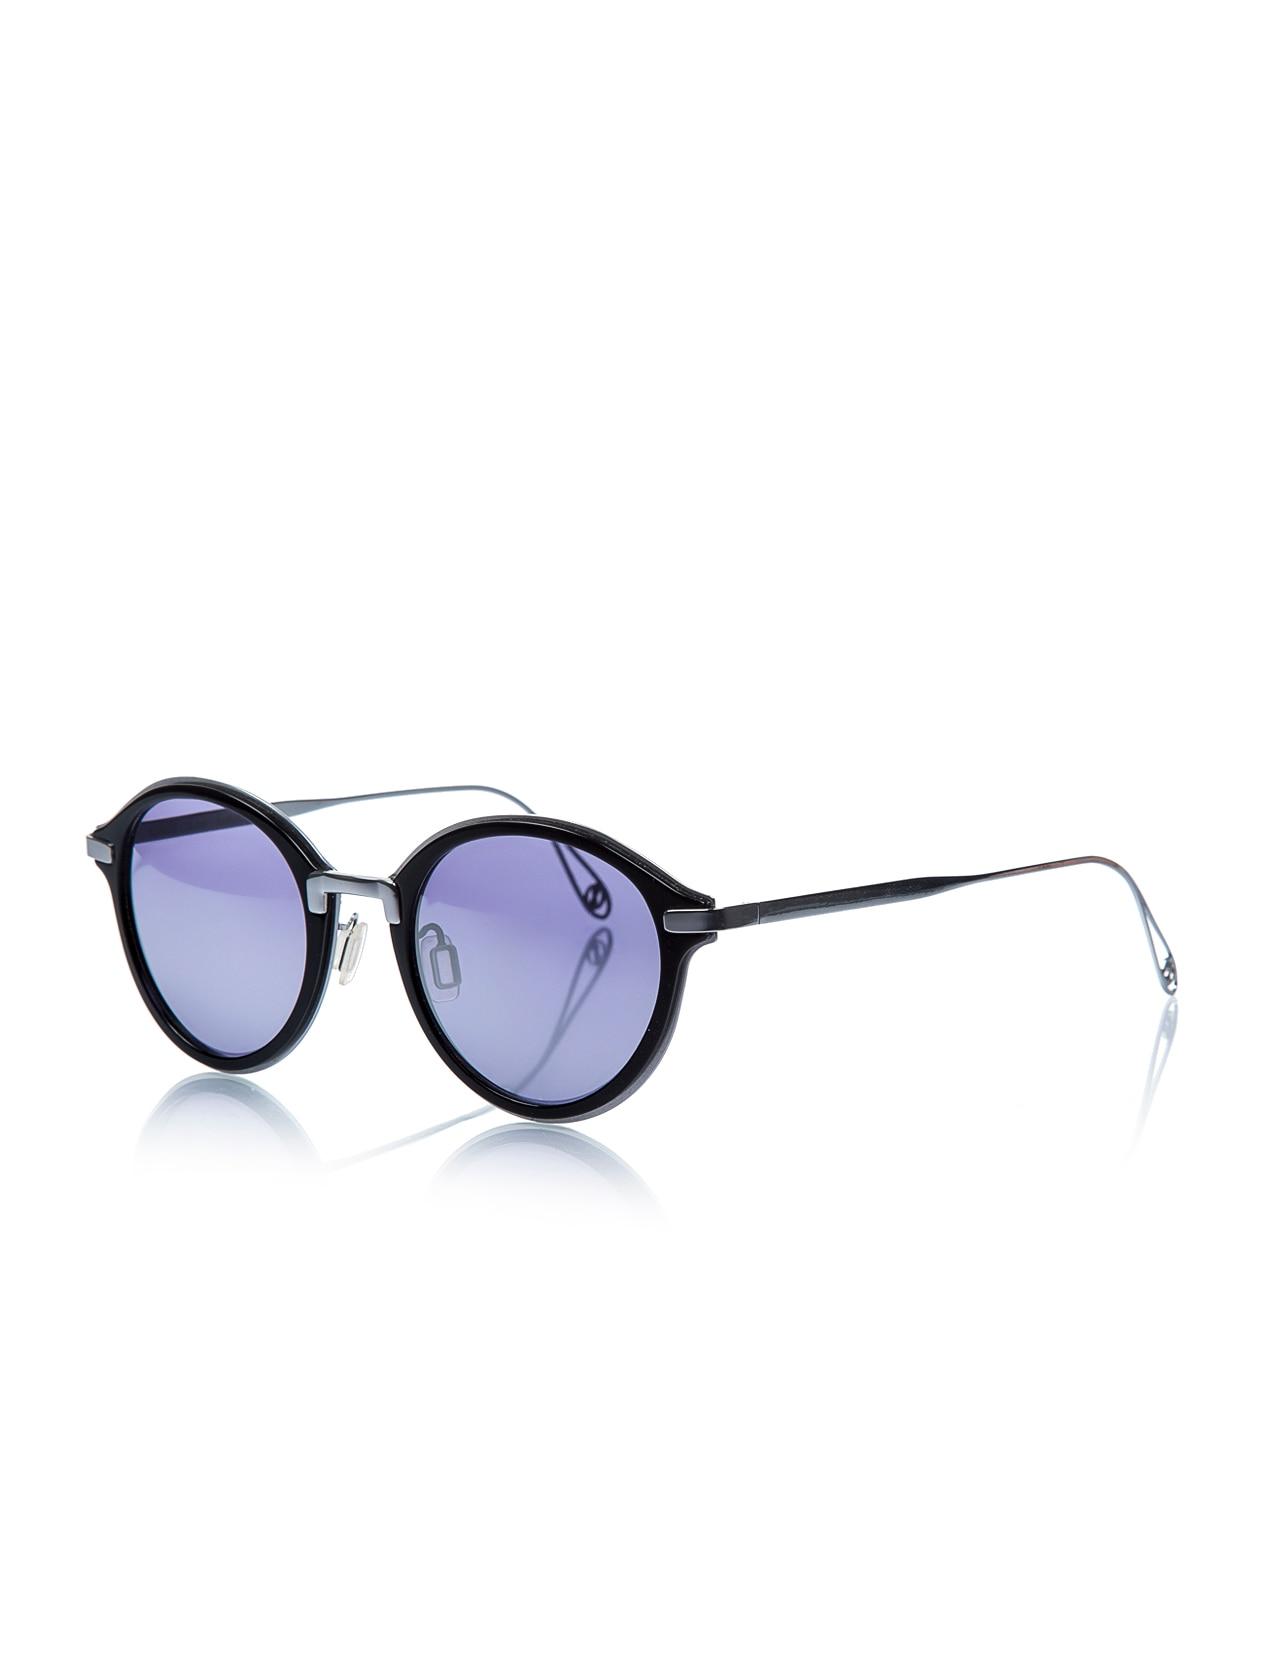 Gafas de sol para mujer msd 3002 b metal negro orgánico redondo 48-23-140 massada